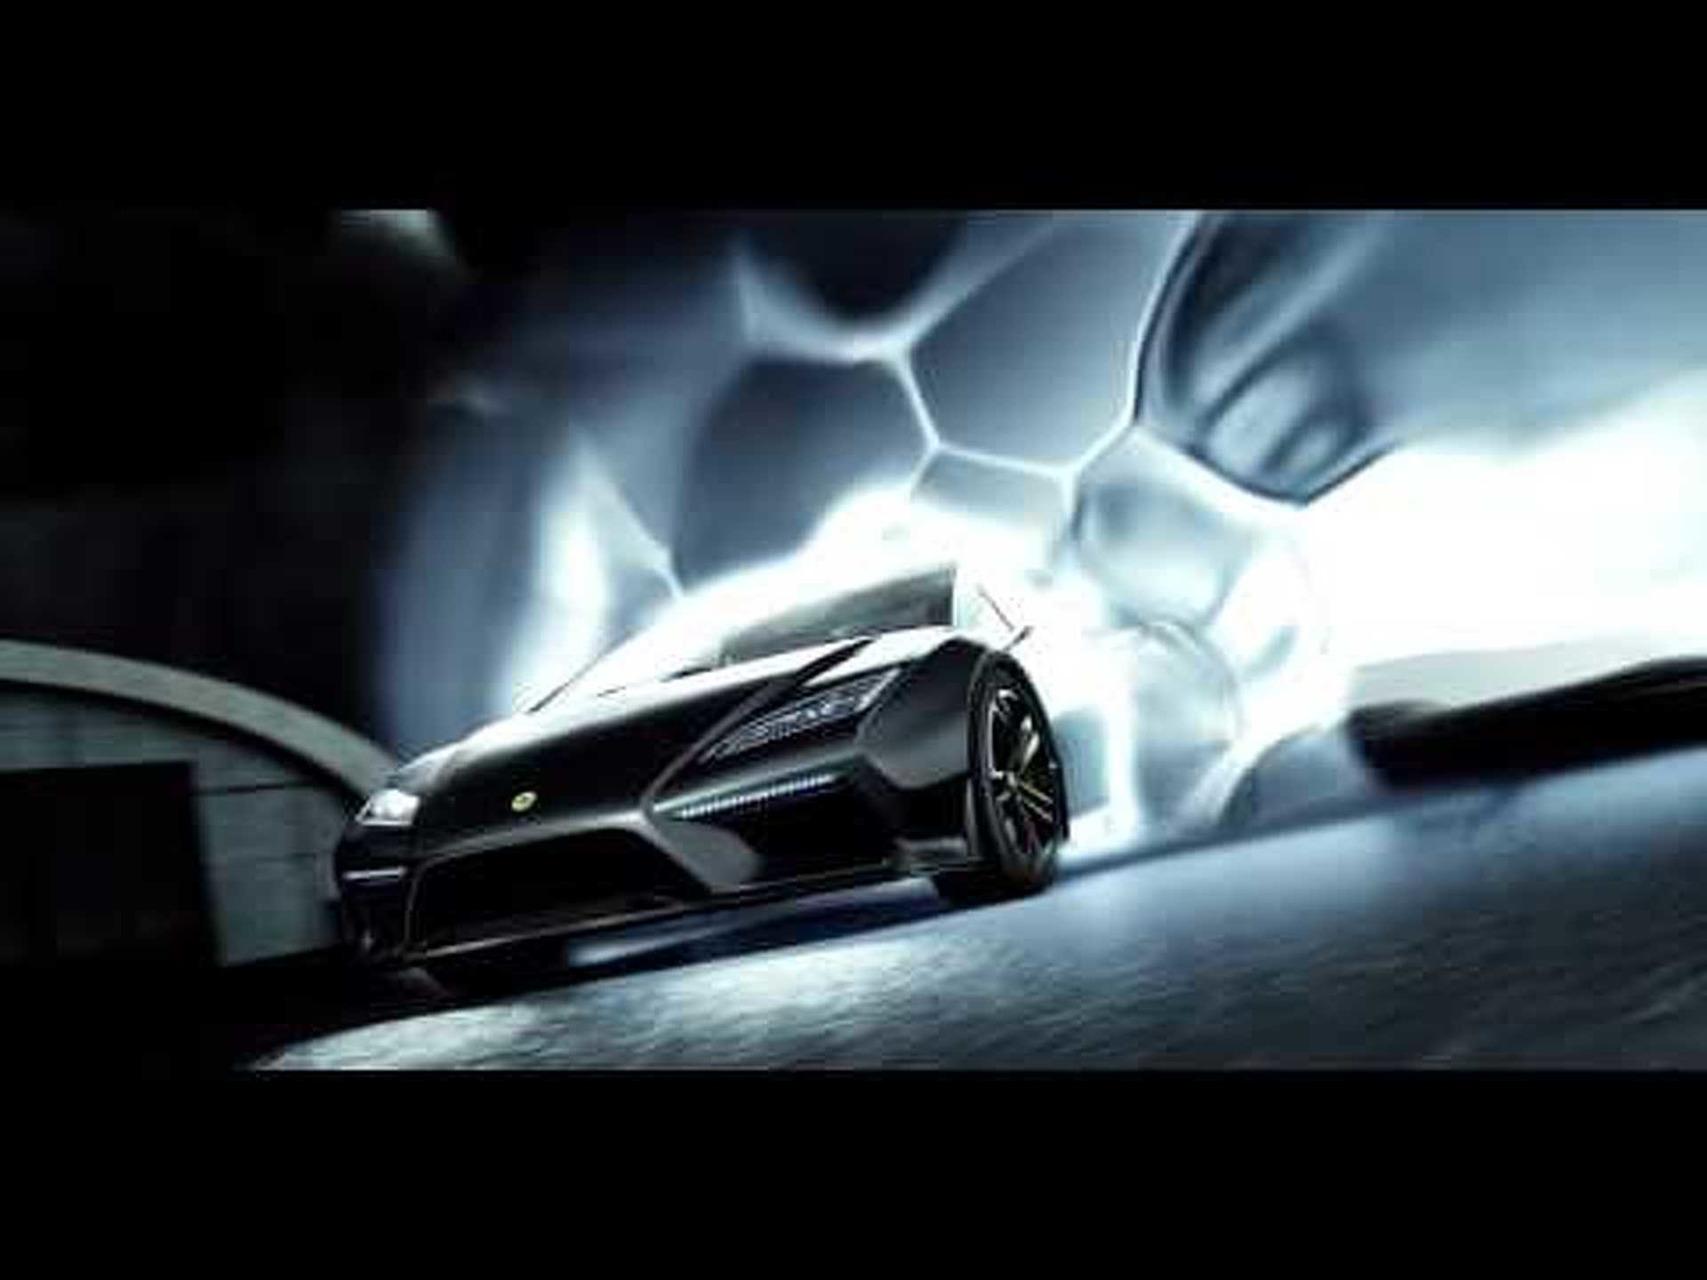 2010 Lotus Esprit Concept Video 2.mov